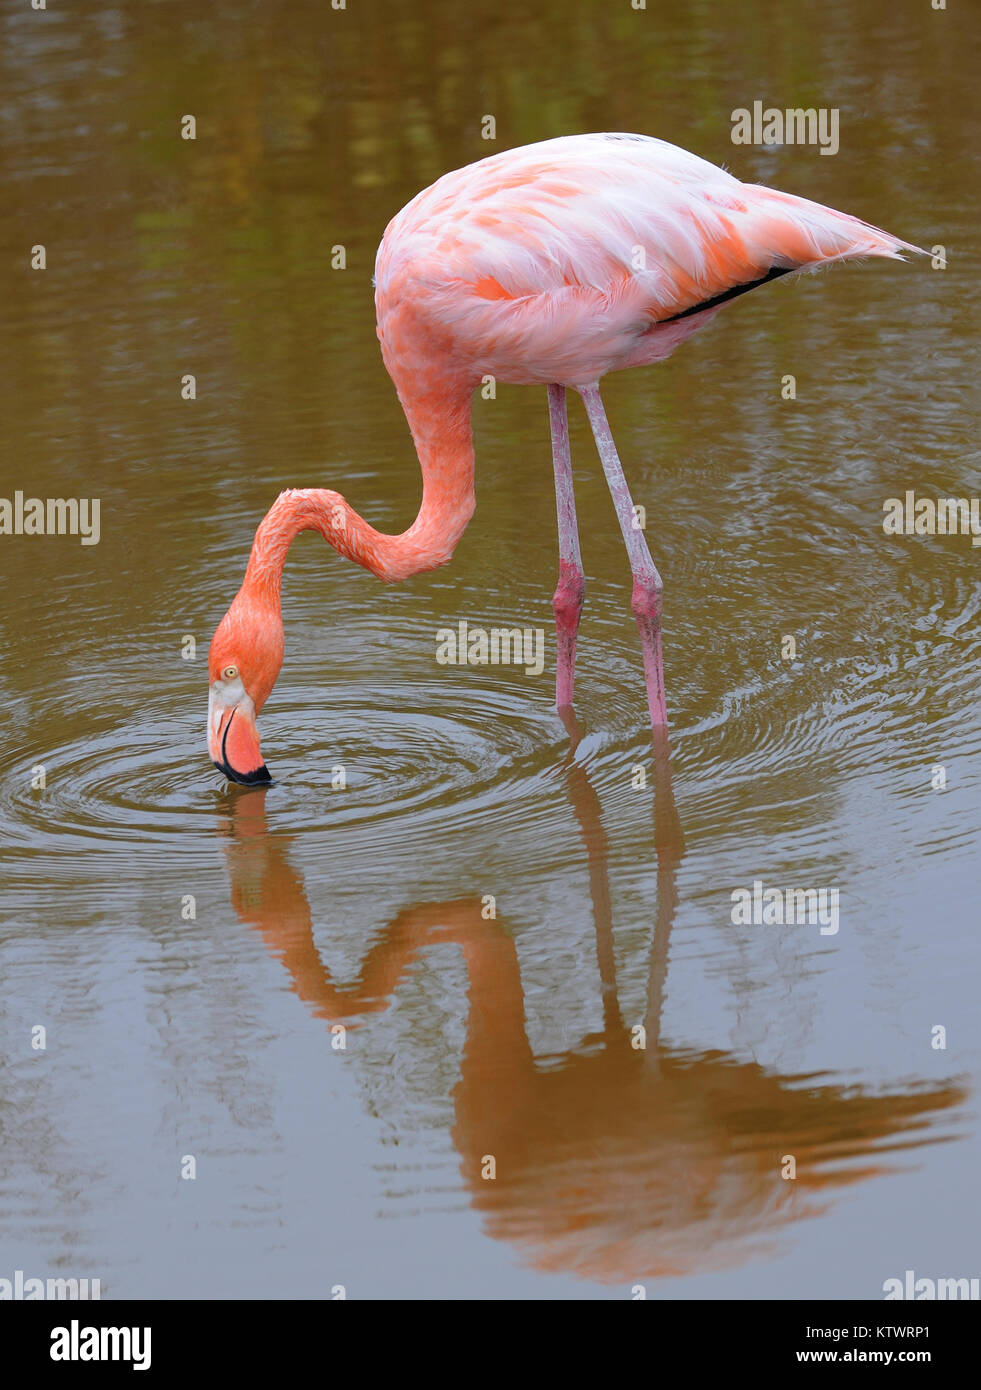 An American flamingo (Phoenicopterus ruber) feeding in a lagoon near Puerto Villamil. Puerto Villamil, Isabela, Stock Photo